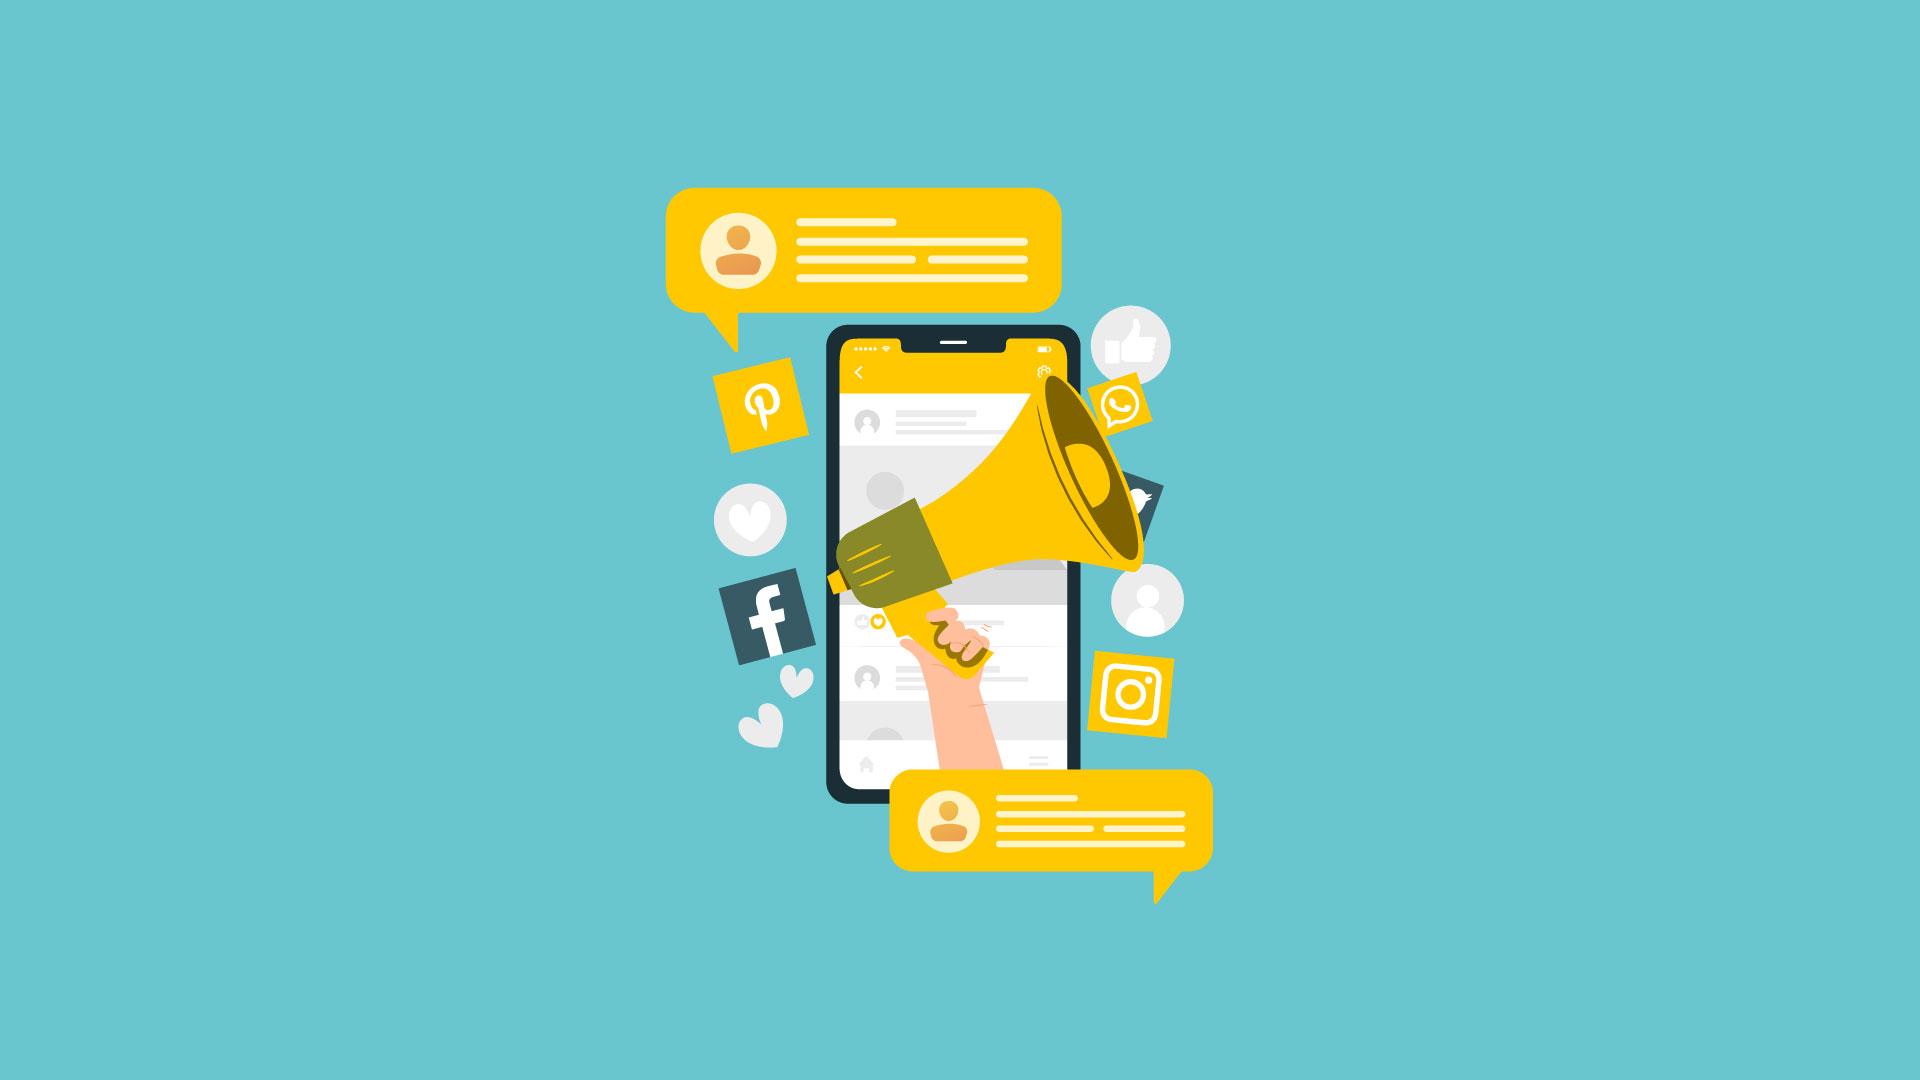 Strategi promosi online